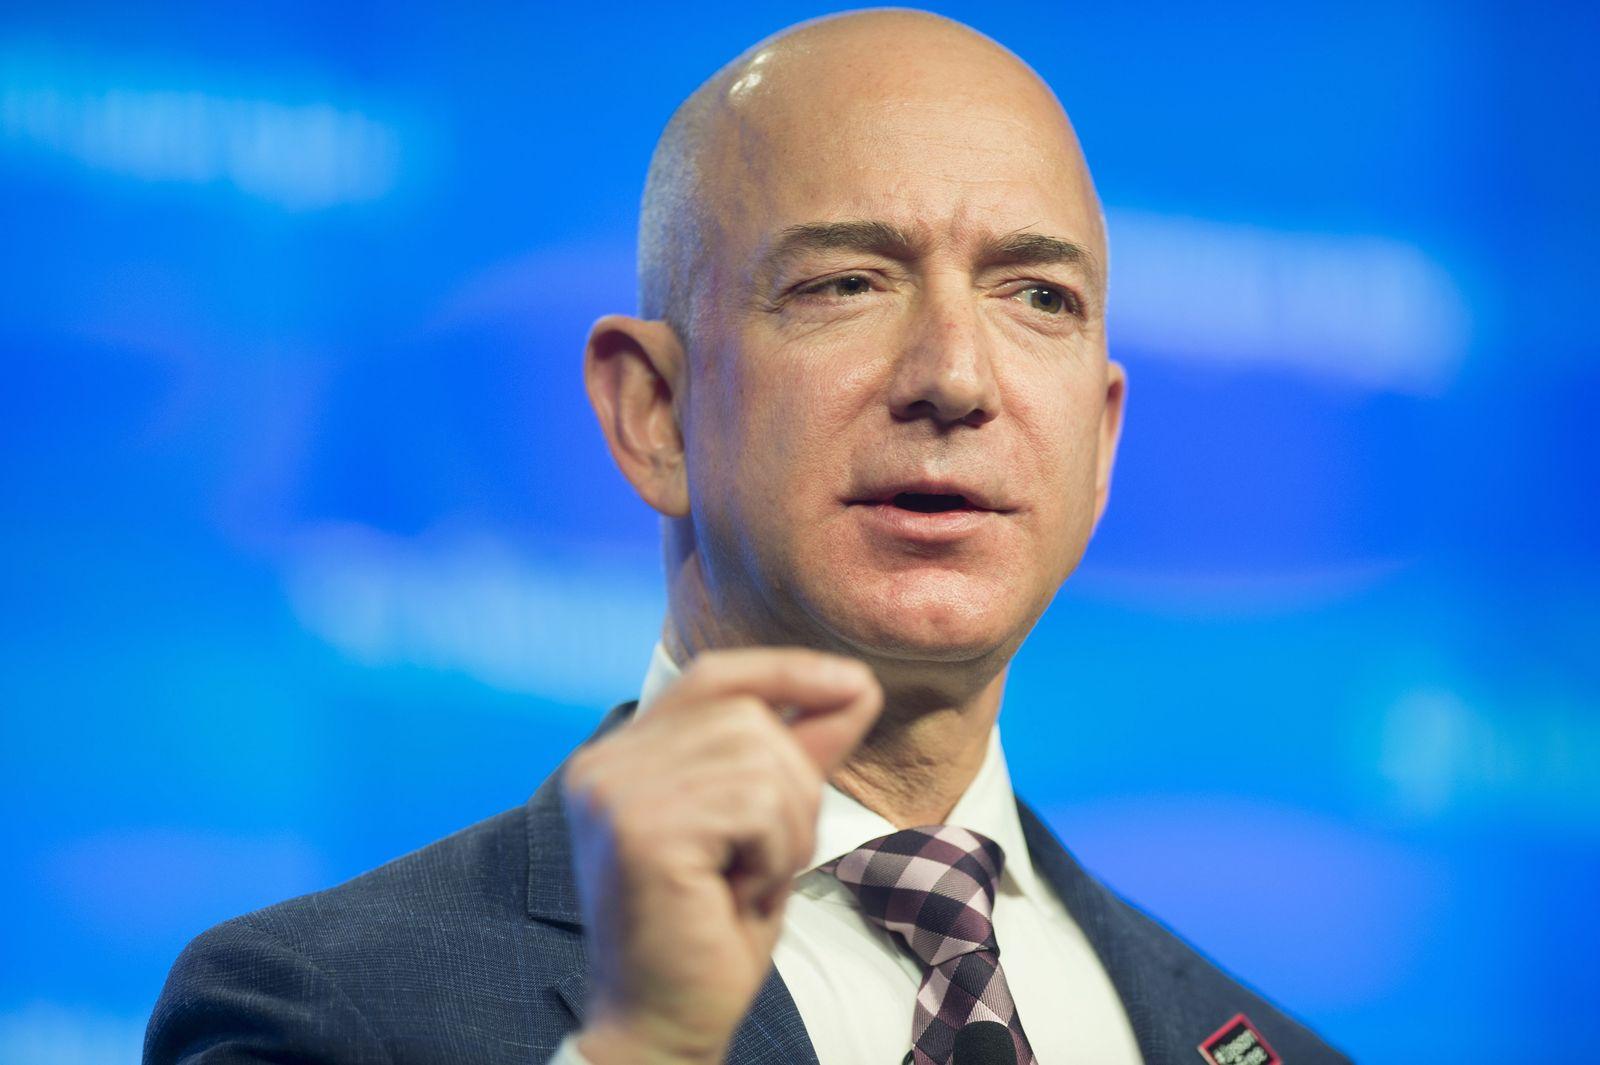 Jeff Bezos/ Amazon